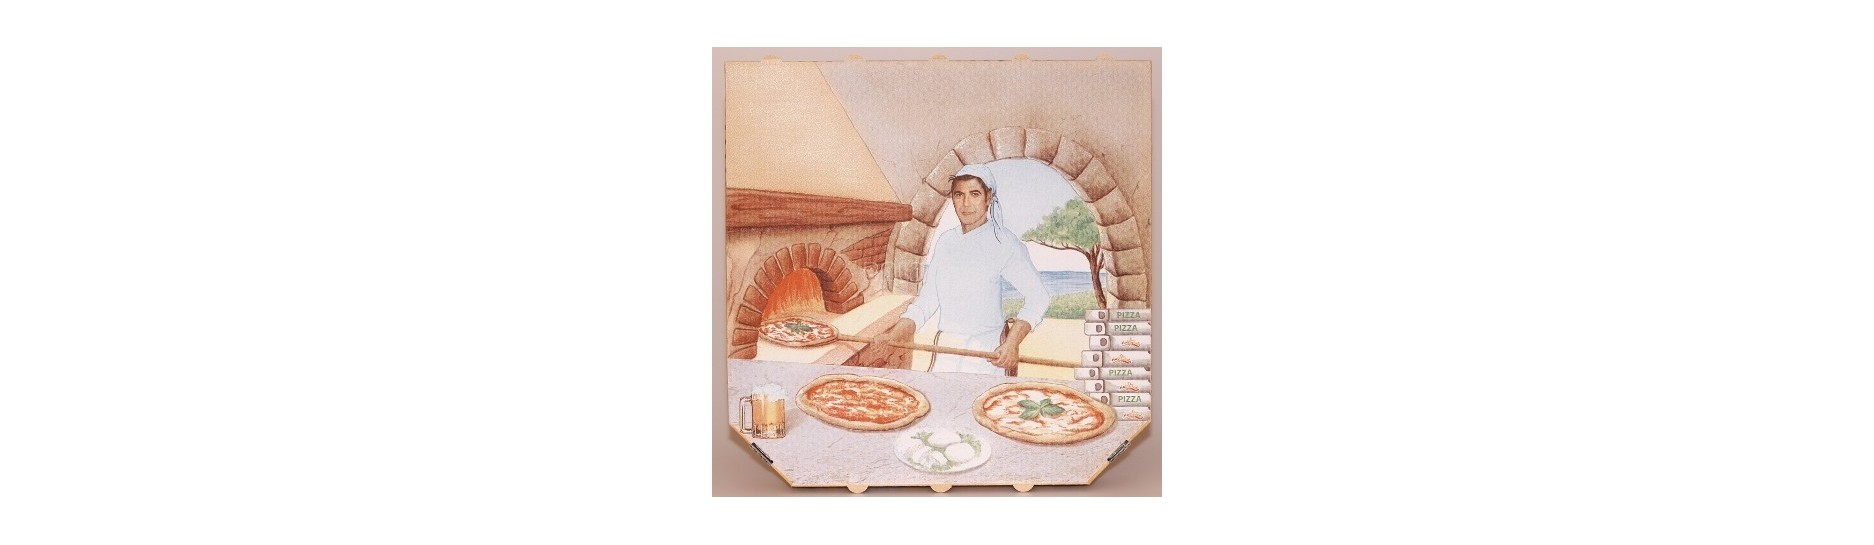 Krabice na pizzu a stojánky | ObalyOstrava.cz